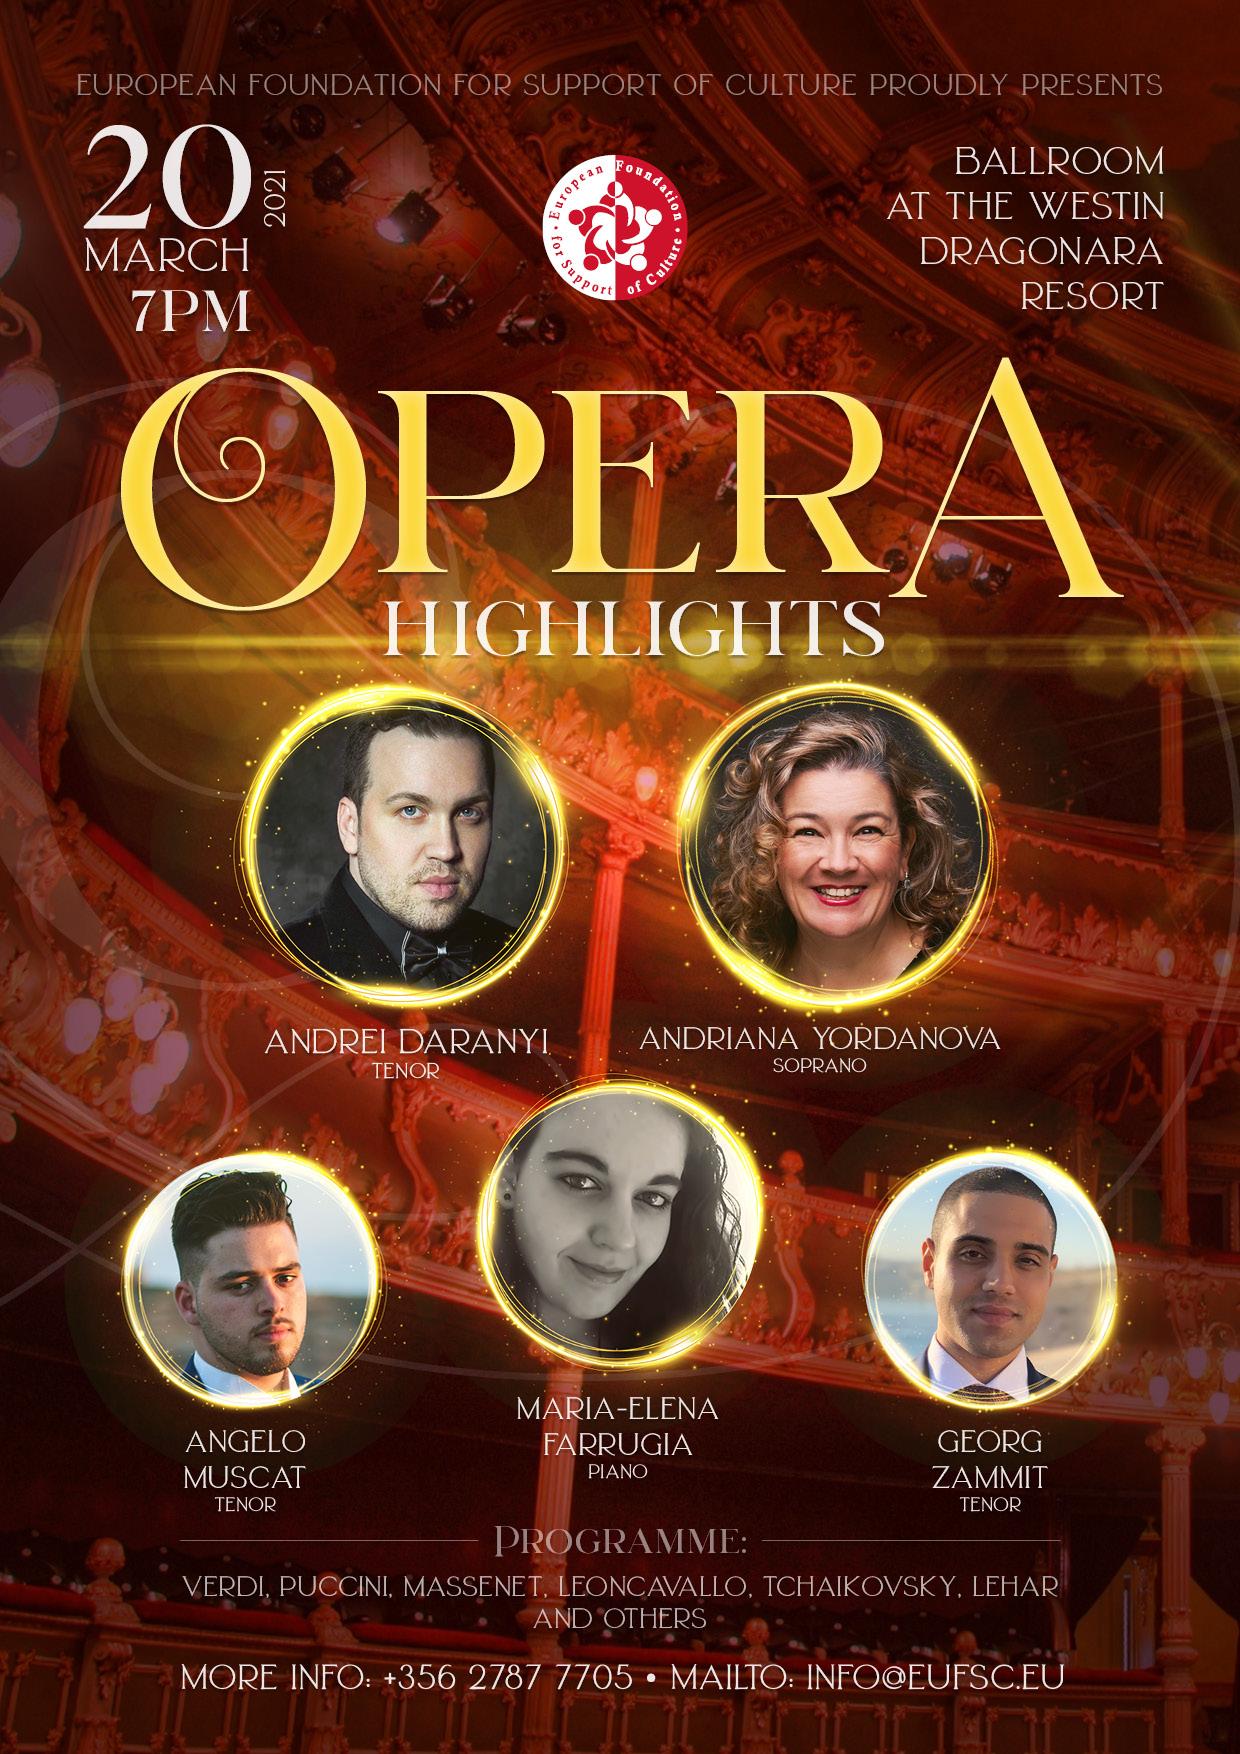 Opera Highlights